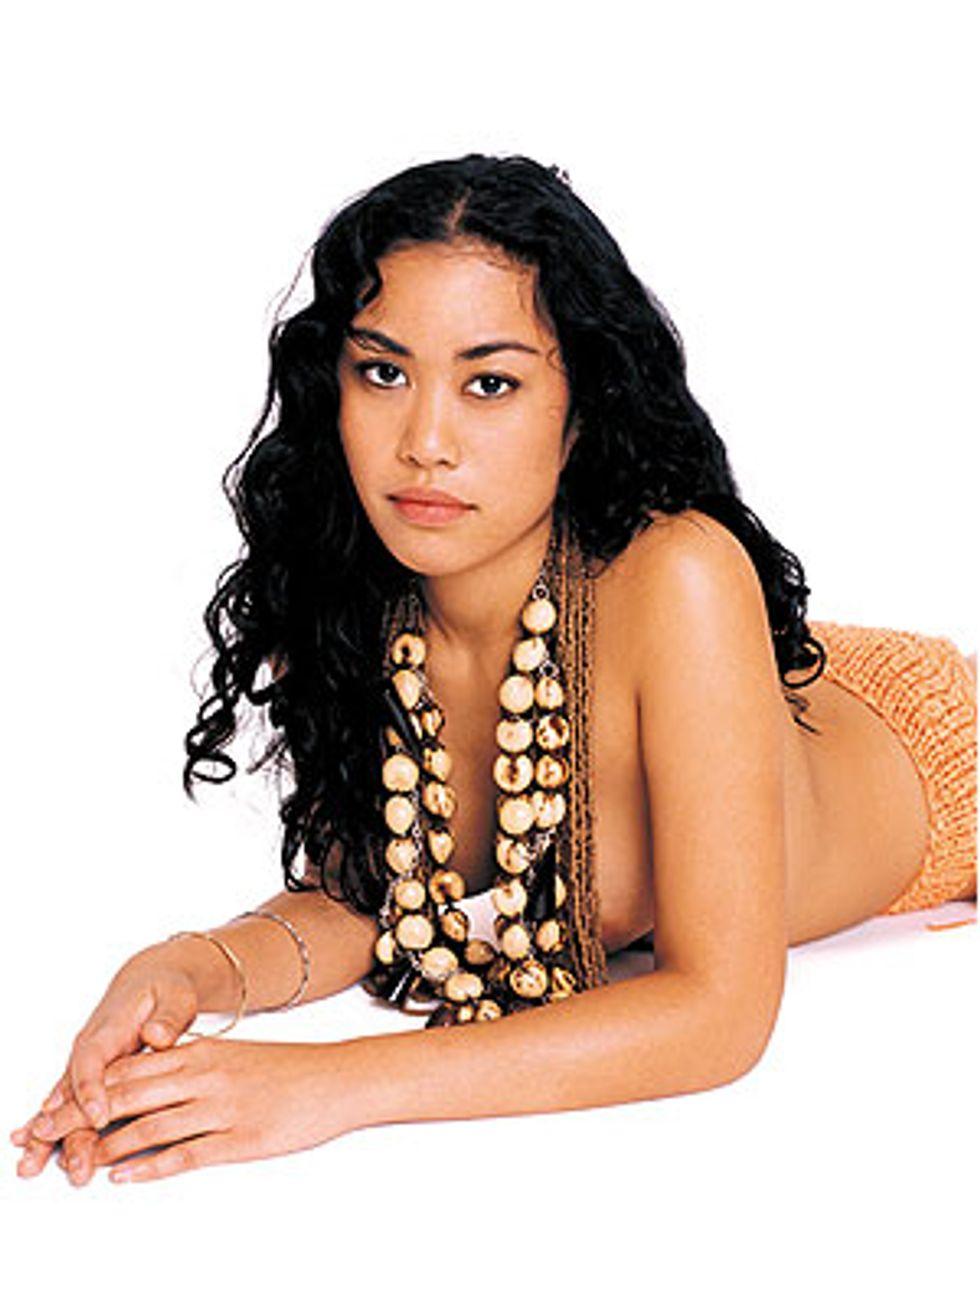 Beautiful People 2003: Tiffany Limos